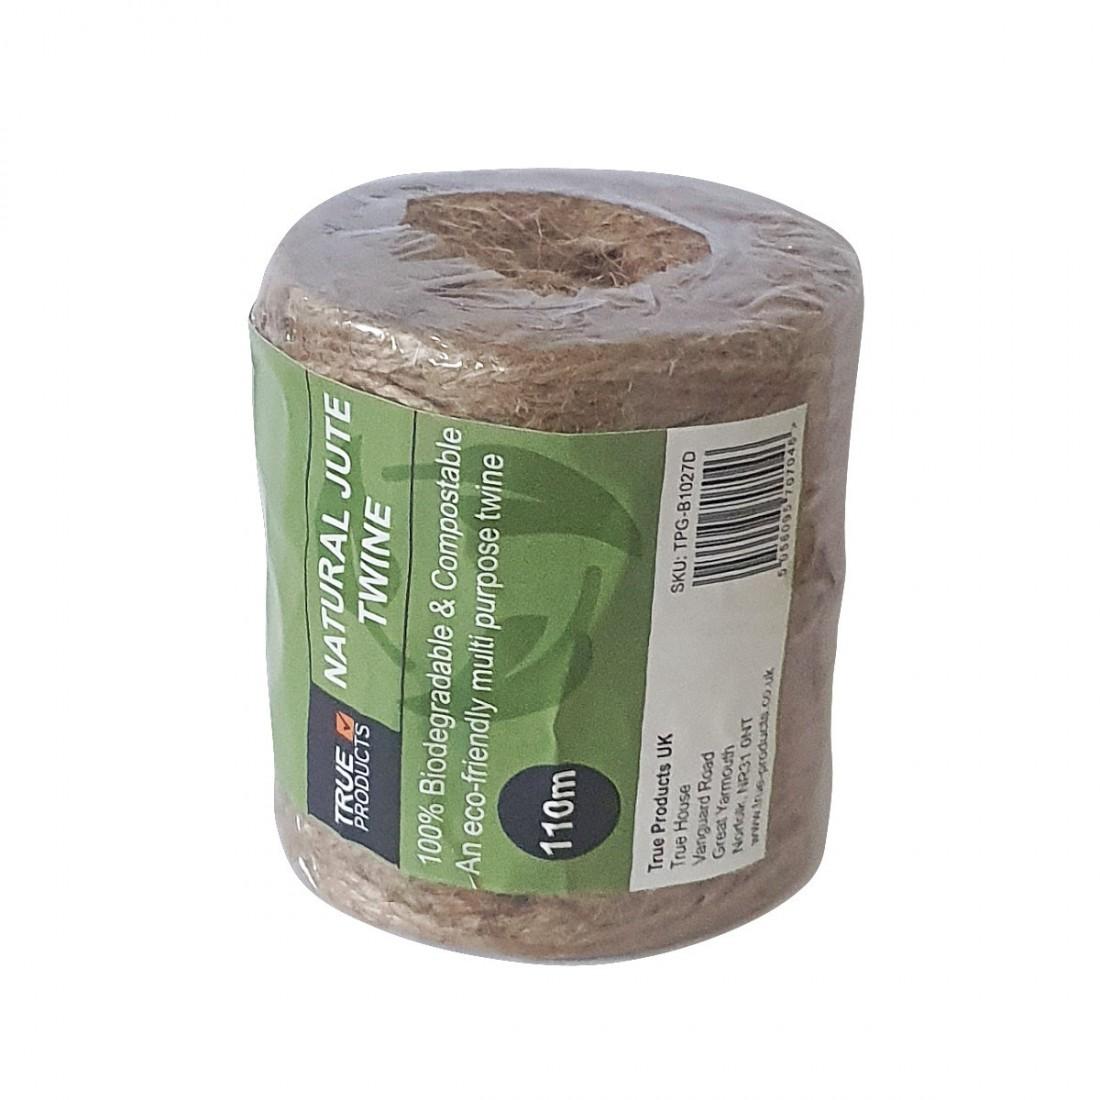 True Products Biodegradable Jute Garden Twine - 100m